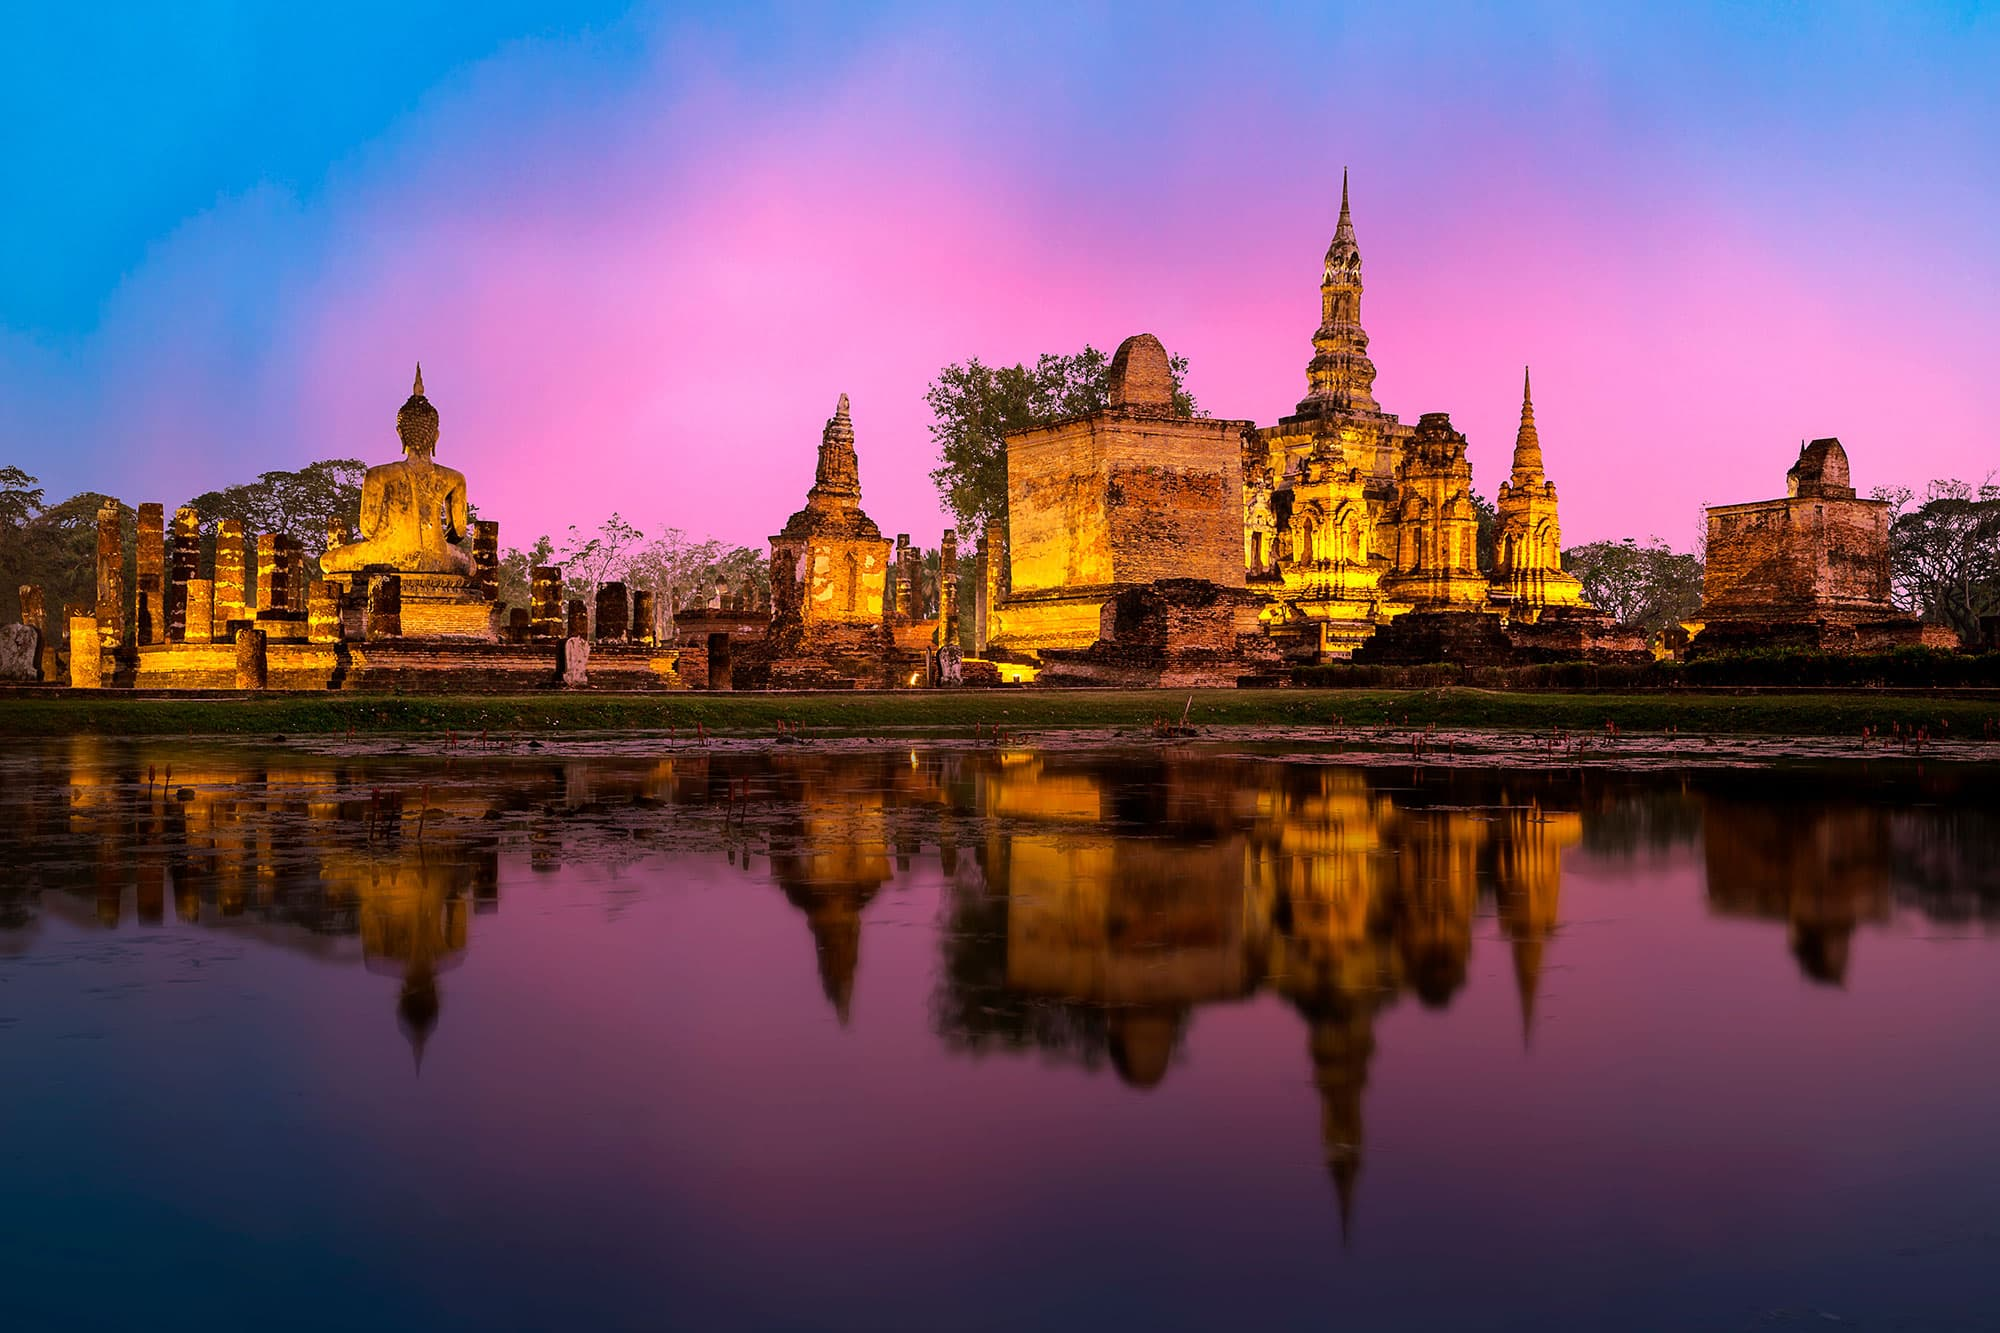 Quintaesencia de Asia - Vietnam- imagen #7